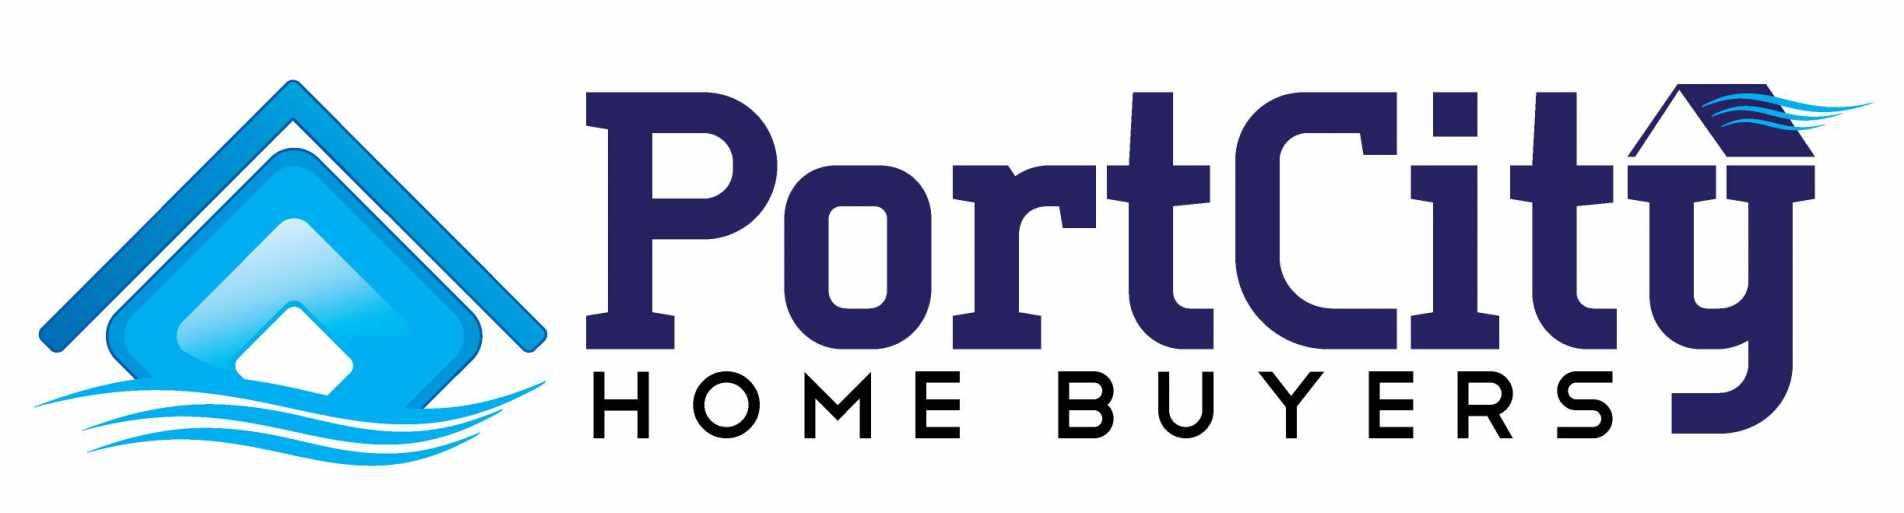 Port City Home Buyers LLC Logo